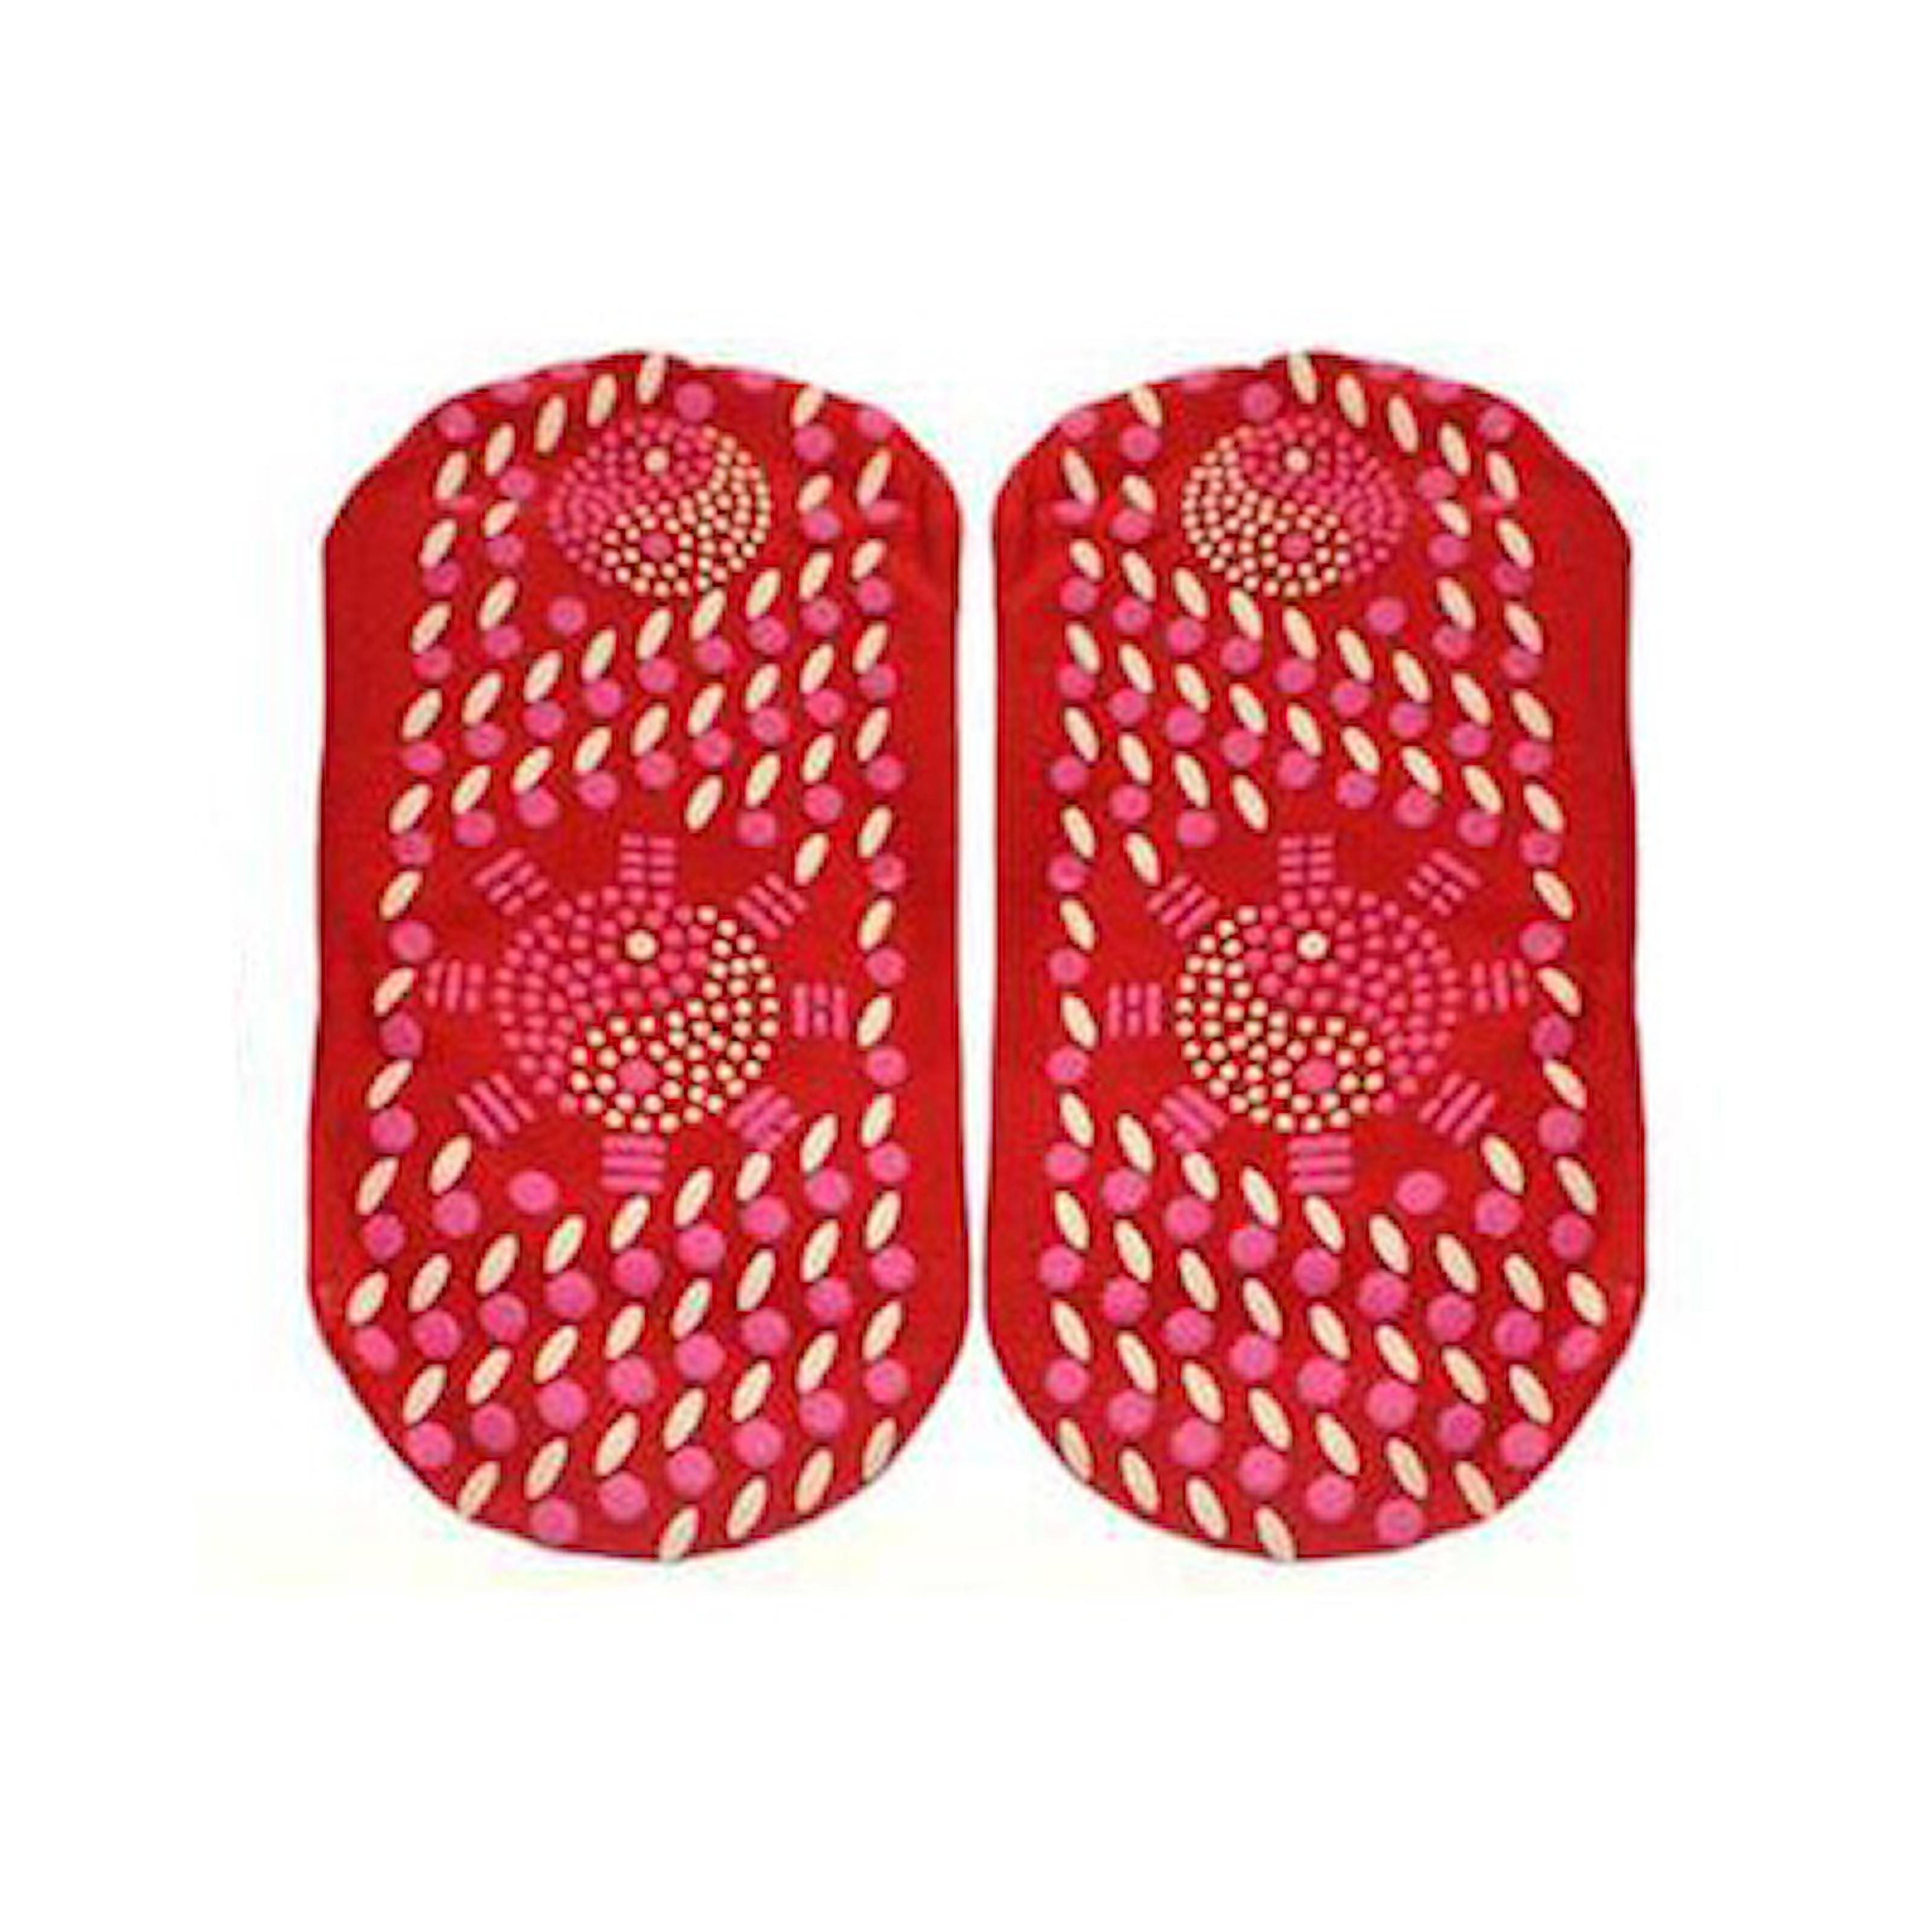 Röd, Self Heating Health Socks, Turmalin-sockor, ,